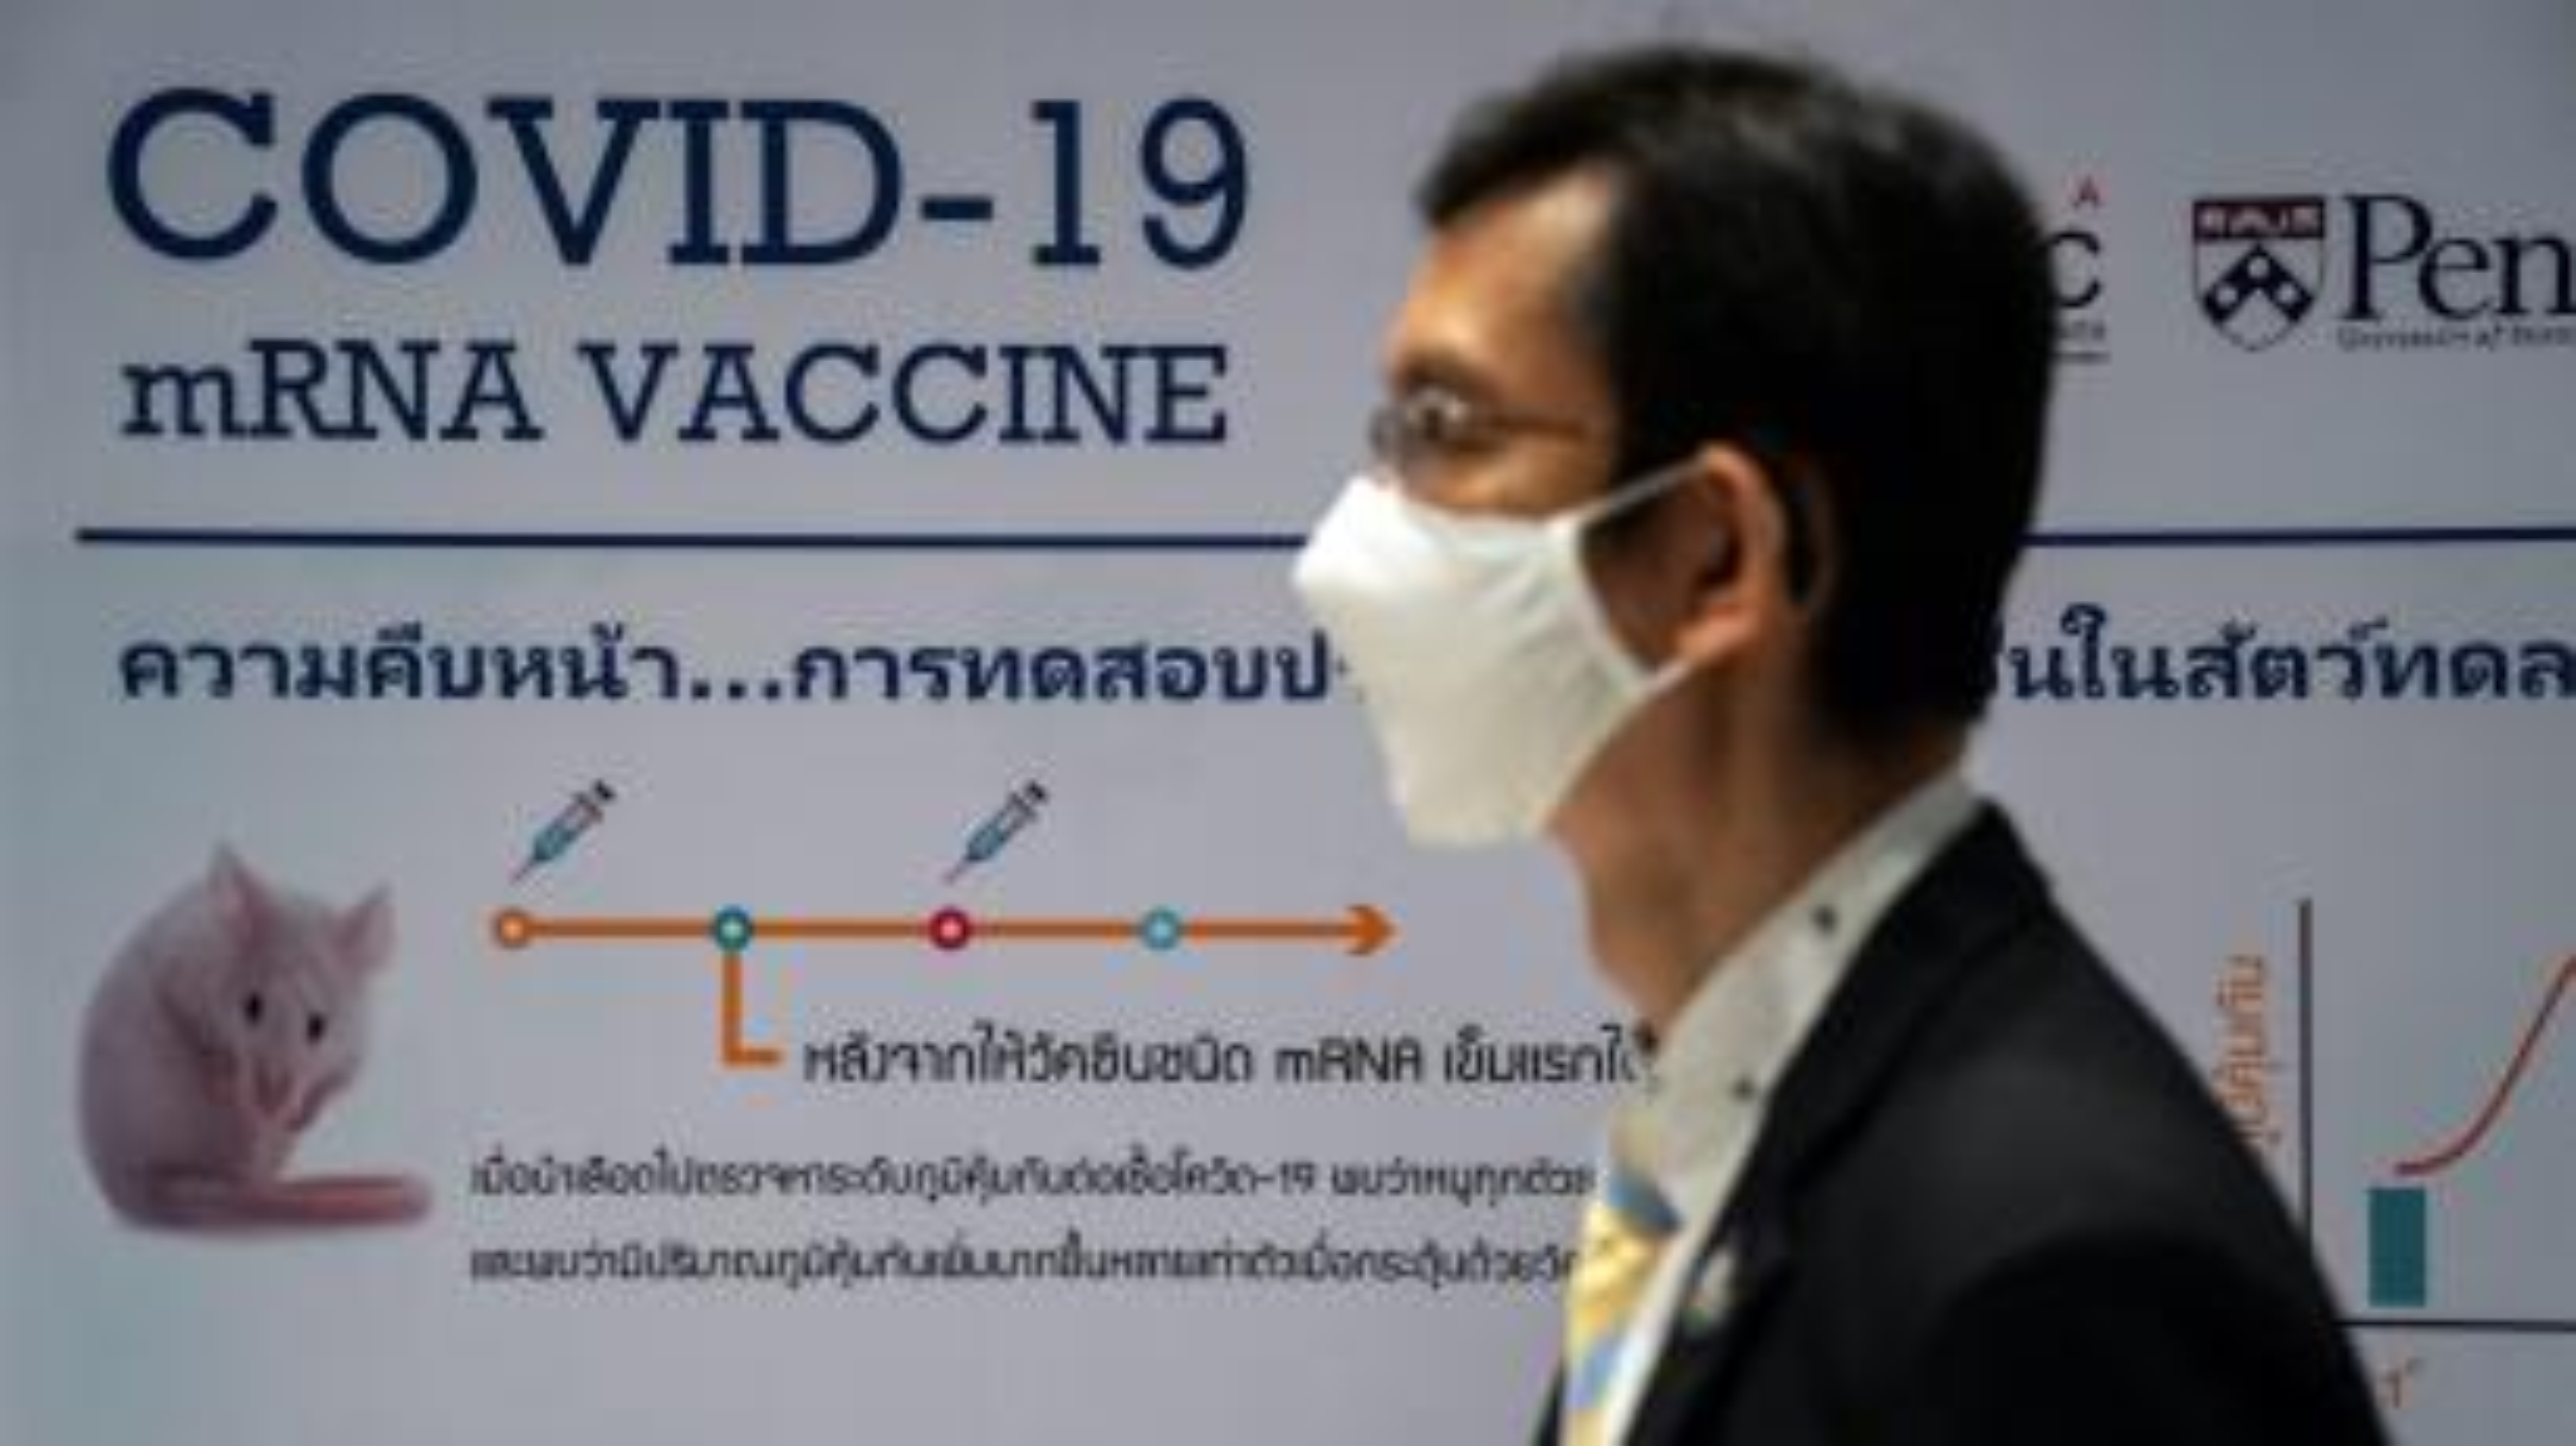 The coronavirus disease (COVID-19) vaccine test in Thailand